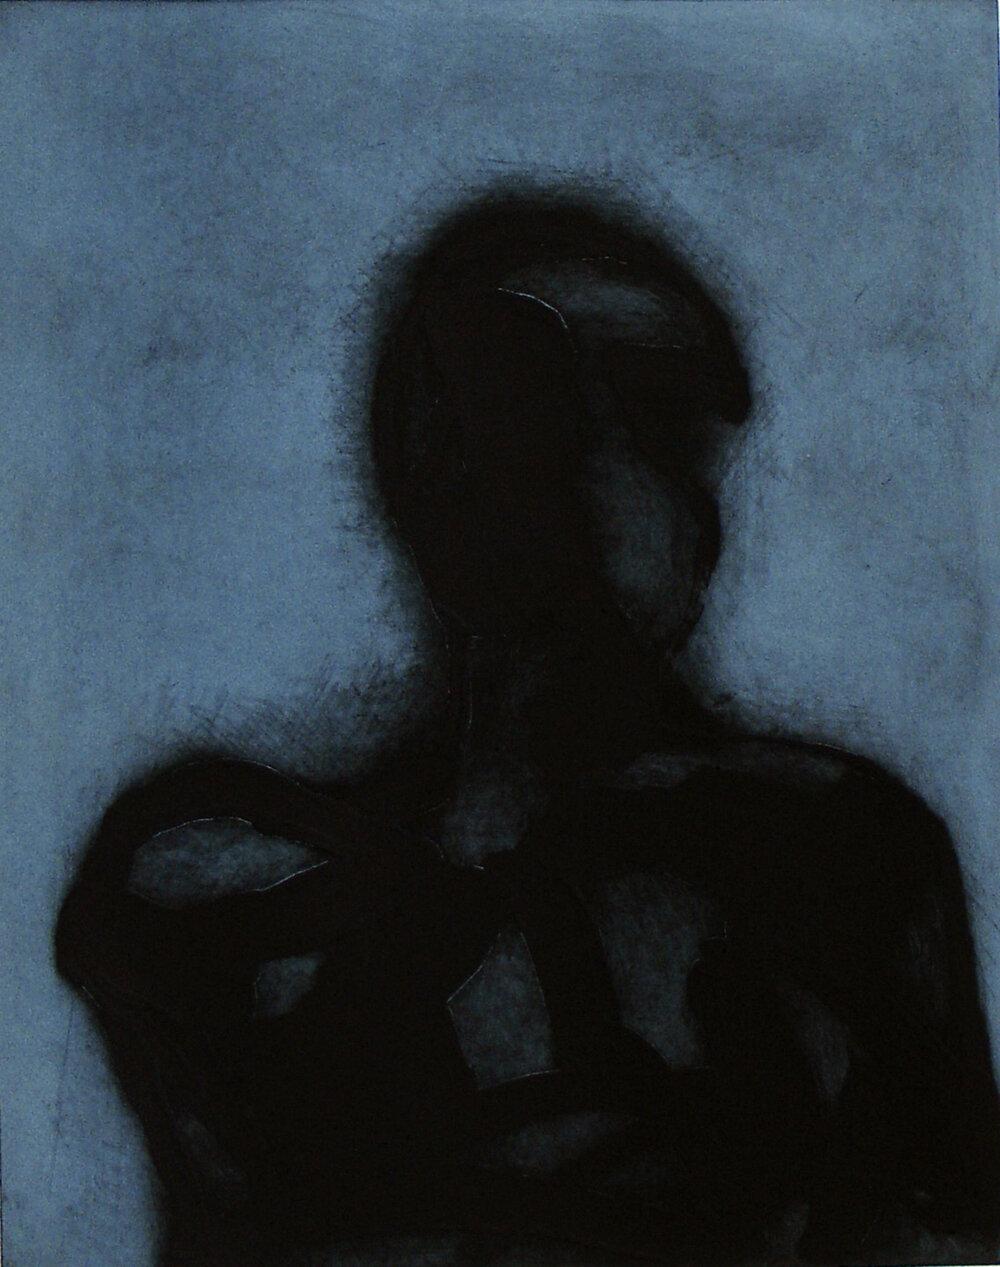 Blue Carborundum by Peter Griffin